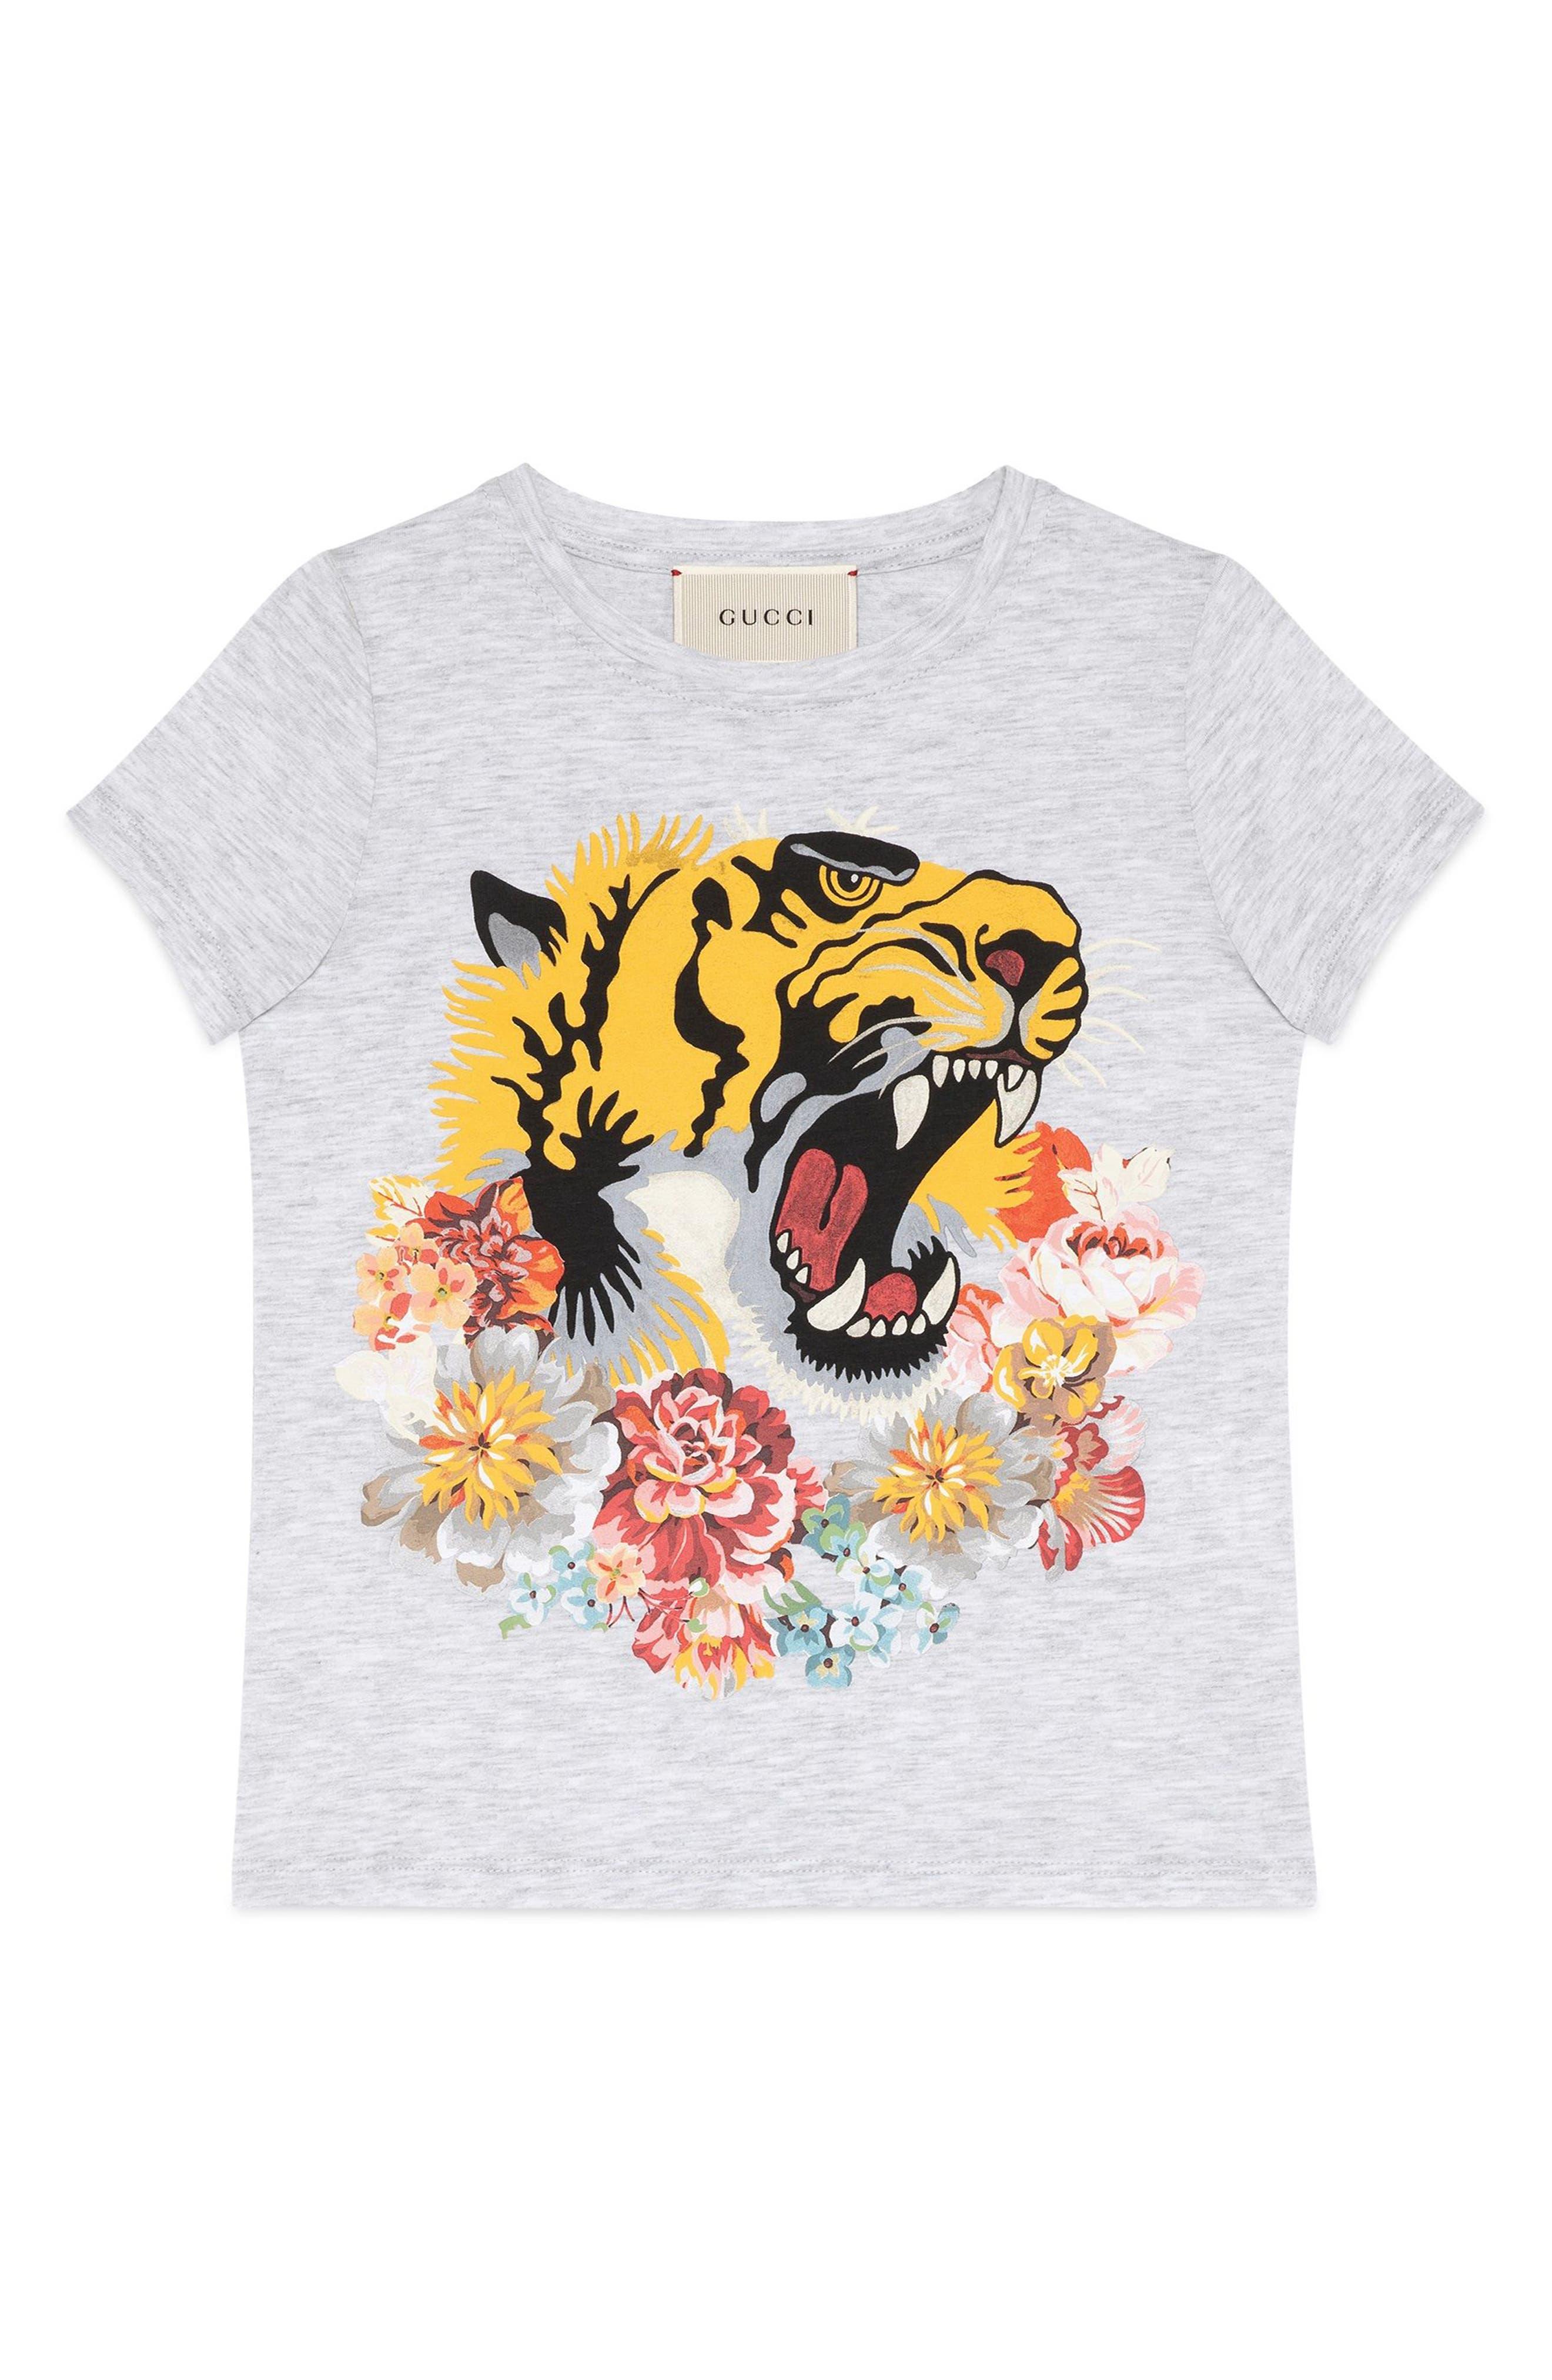 Gucci Tiger Graphic Tee (Little Girls & Big Girls)